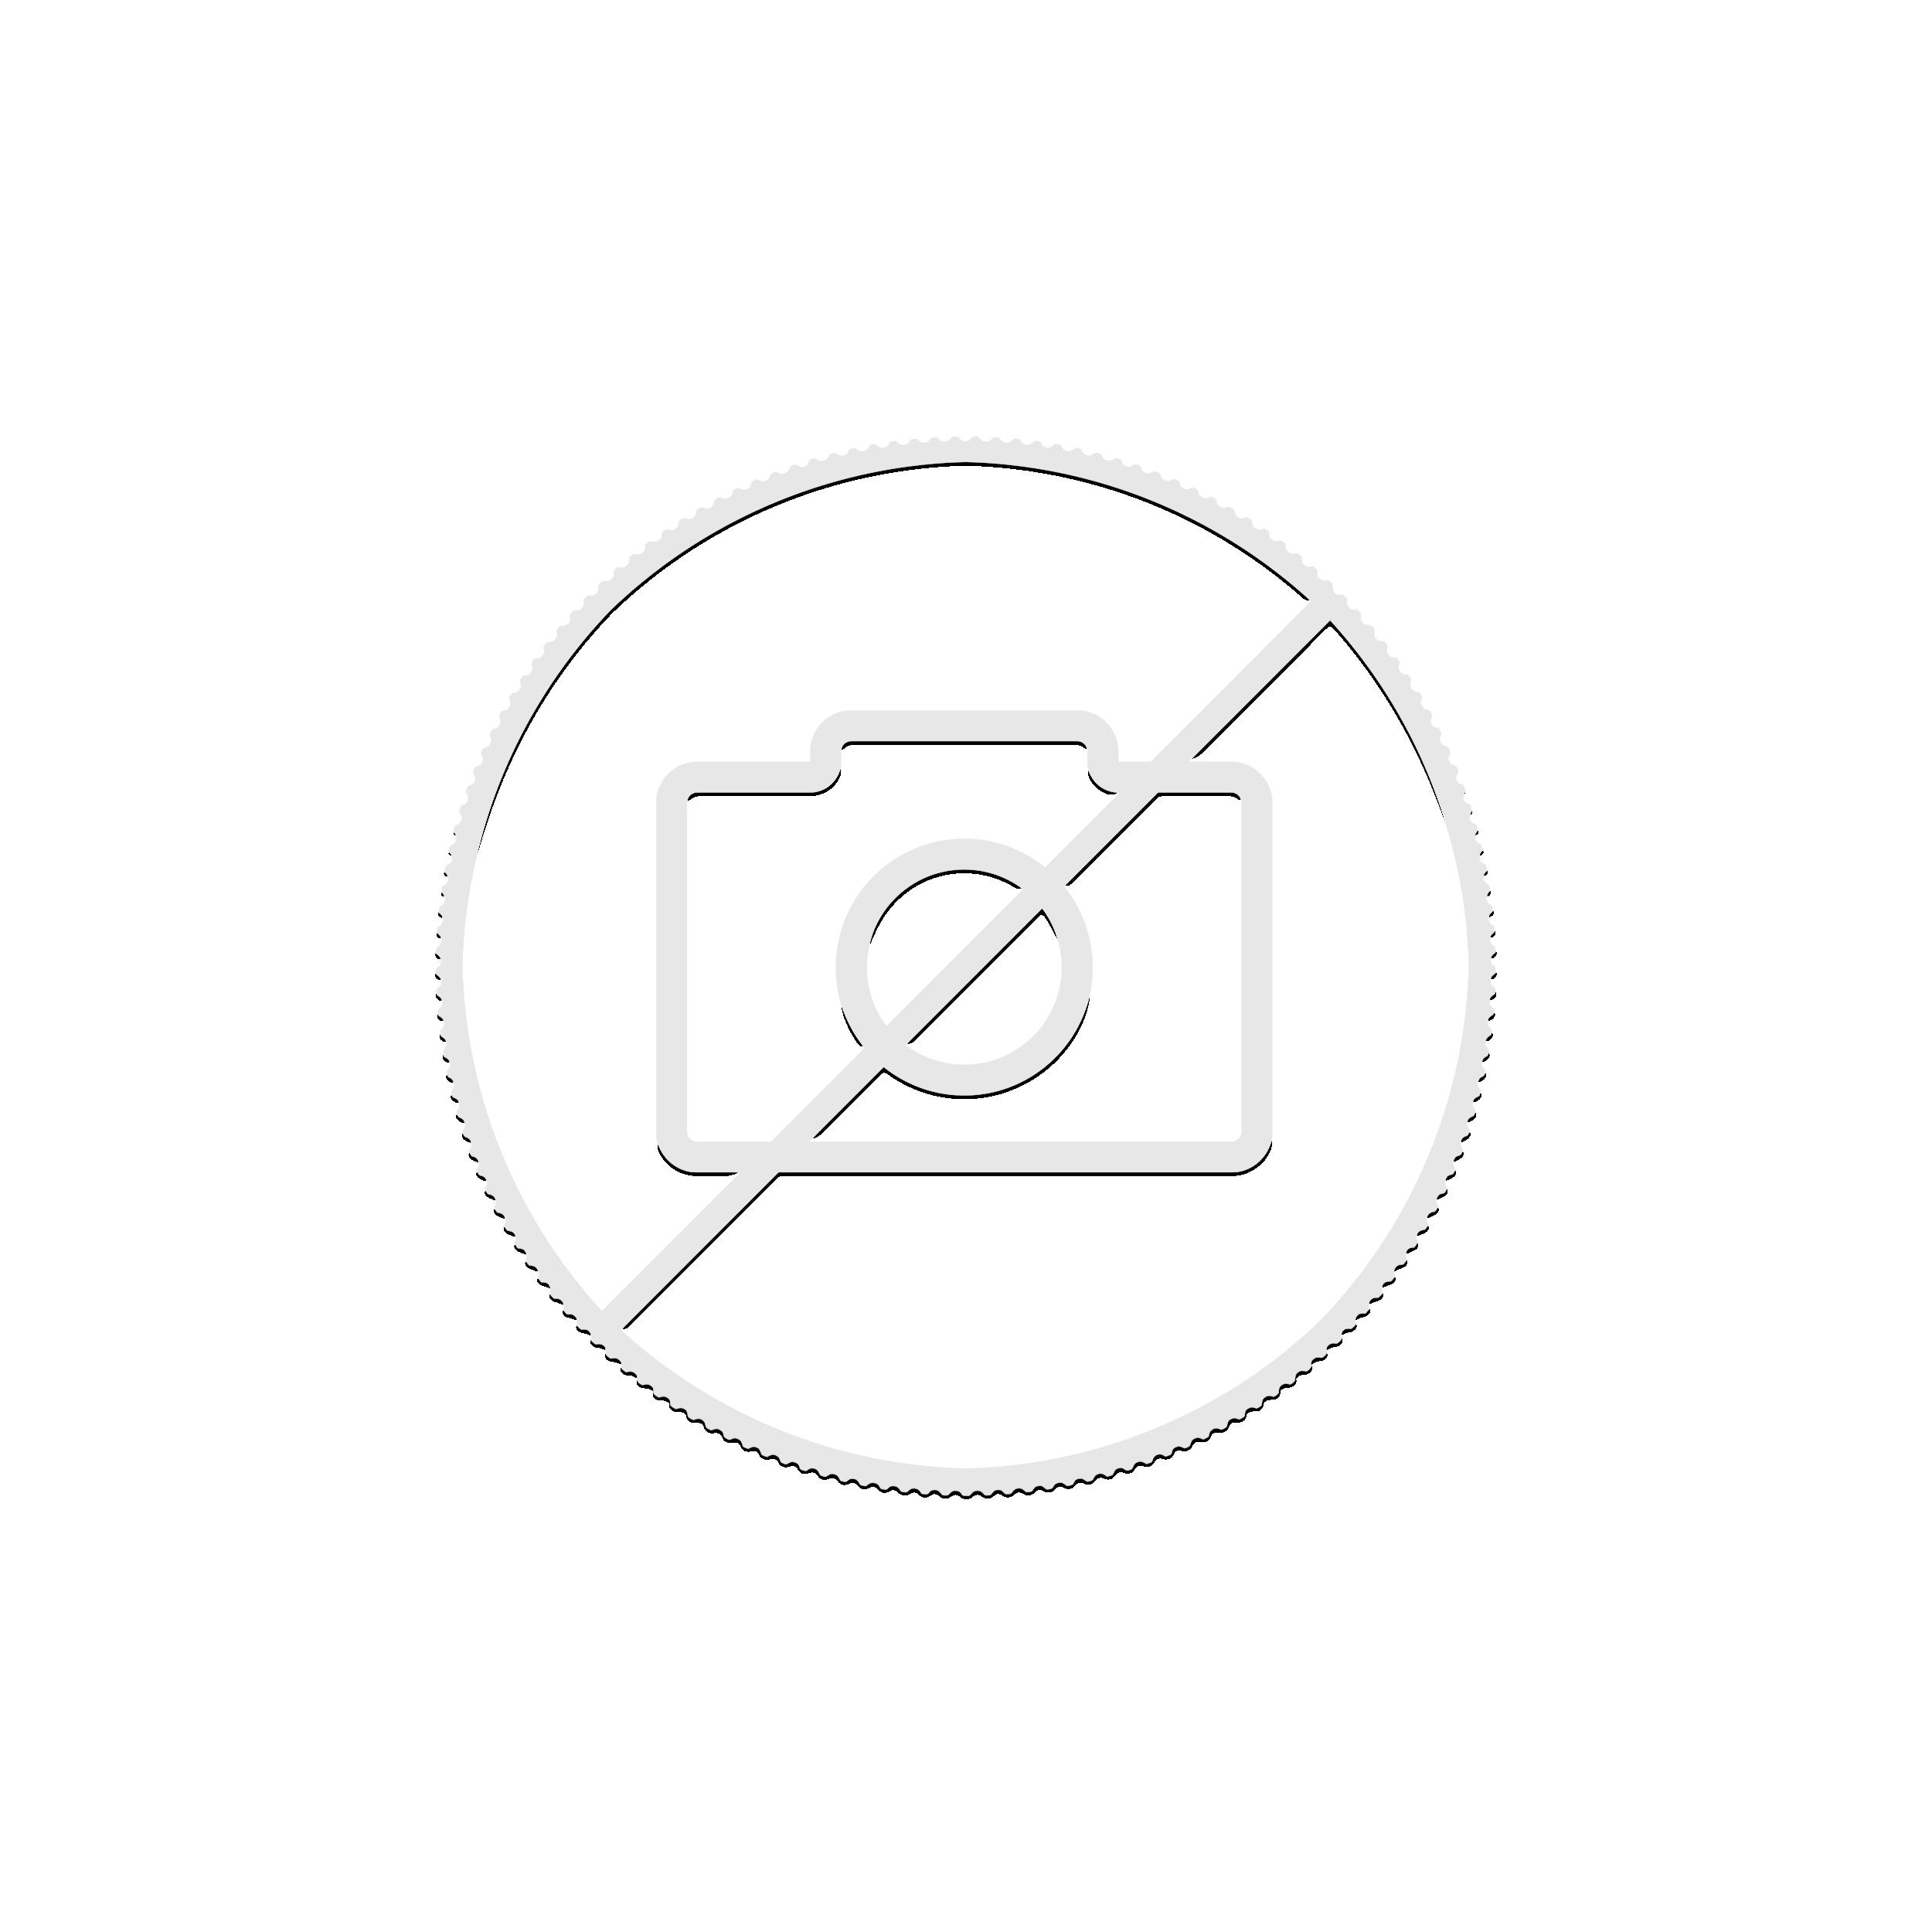 9 troy ounce silver coin set superheroes